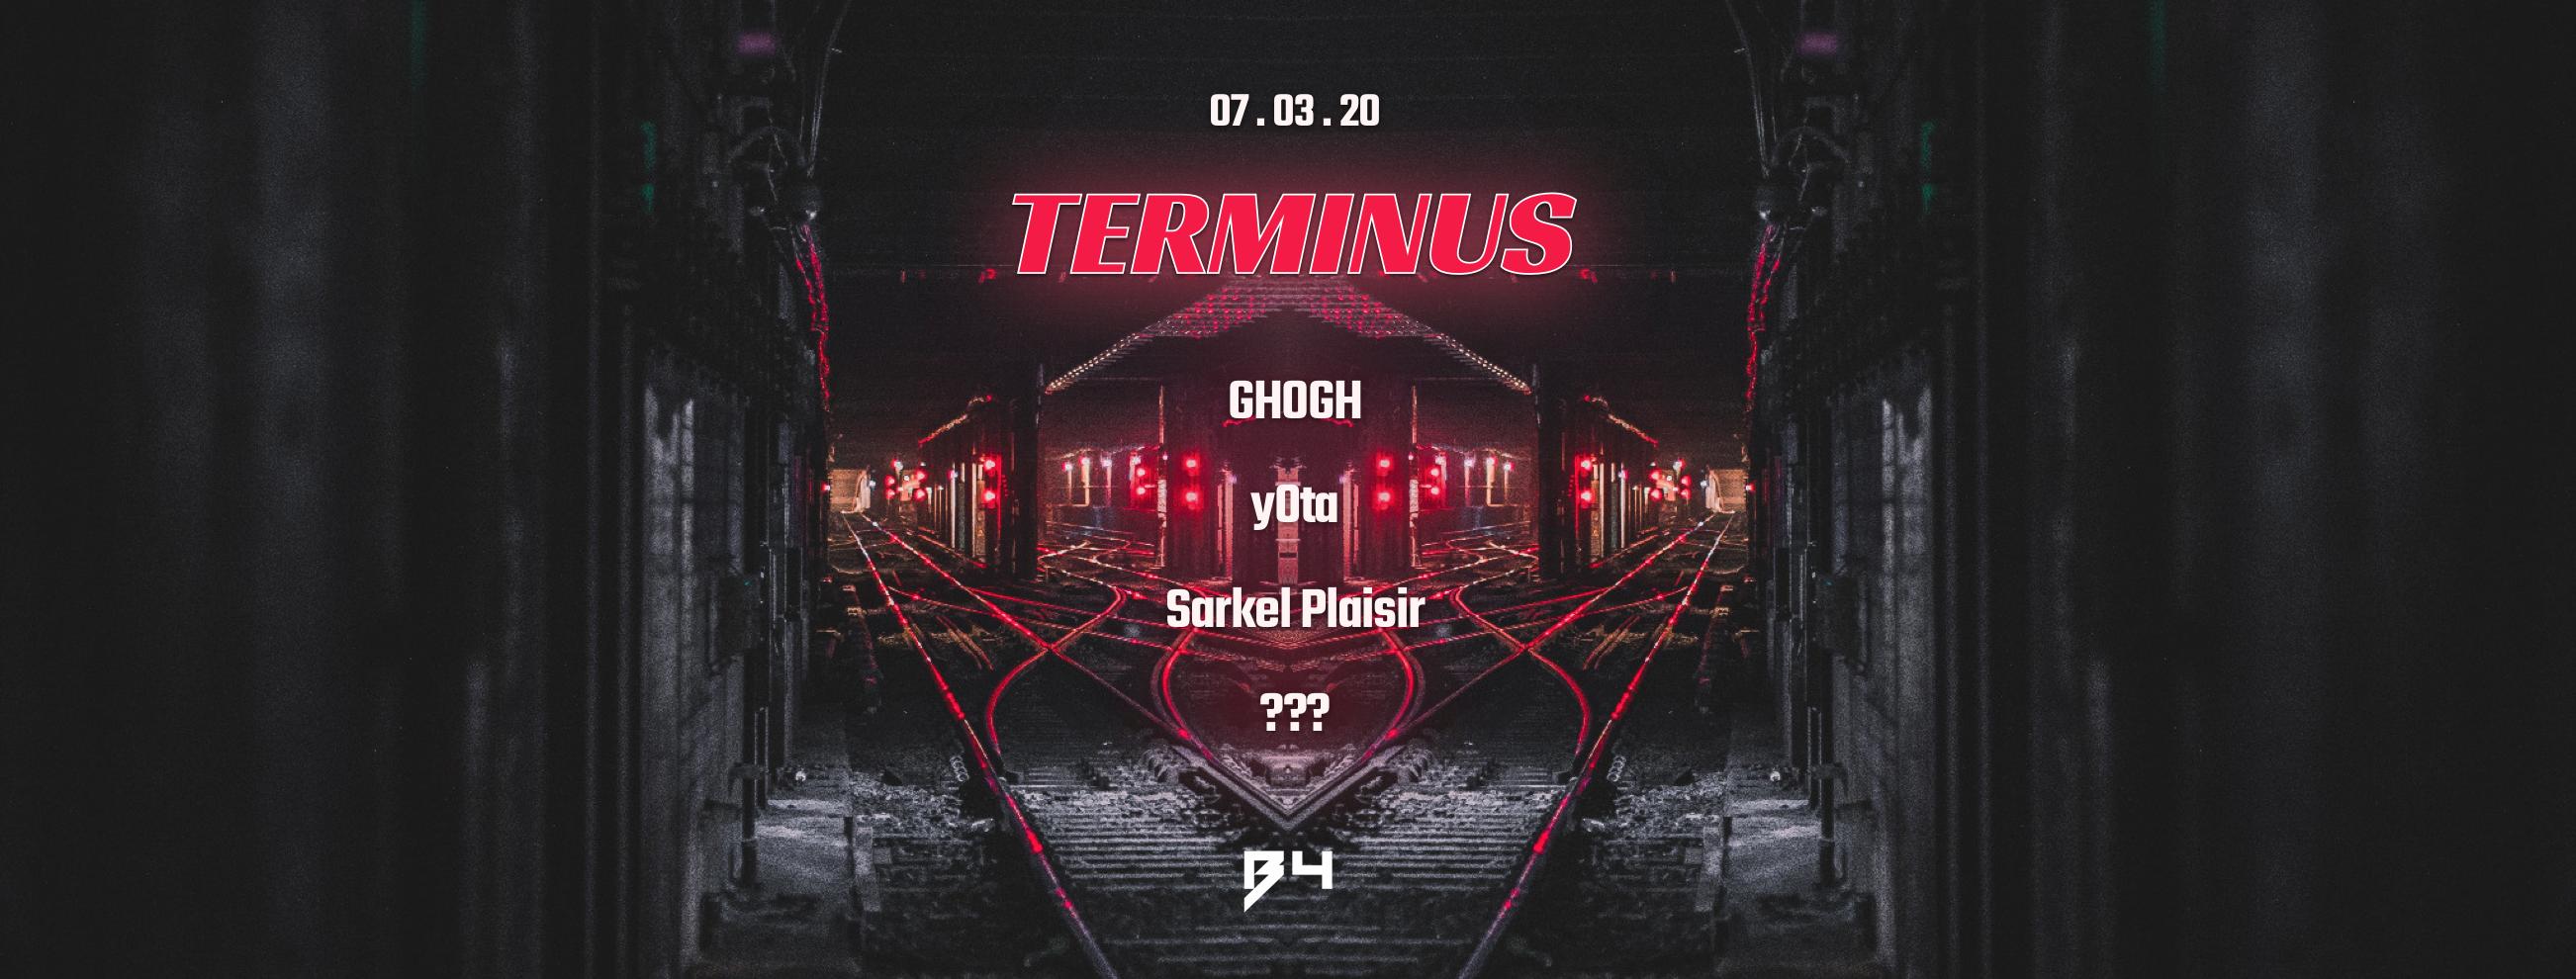 B4 Techno: Terminus